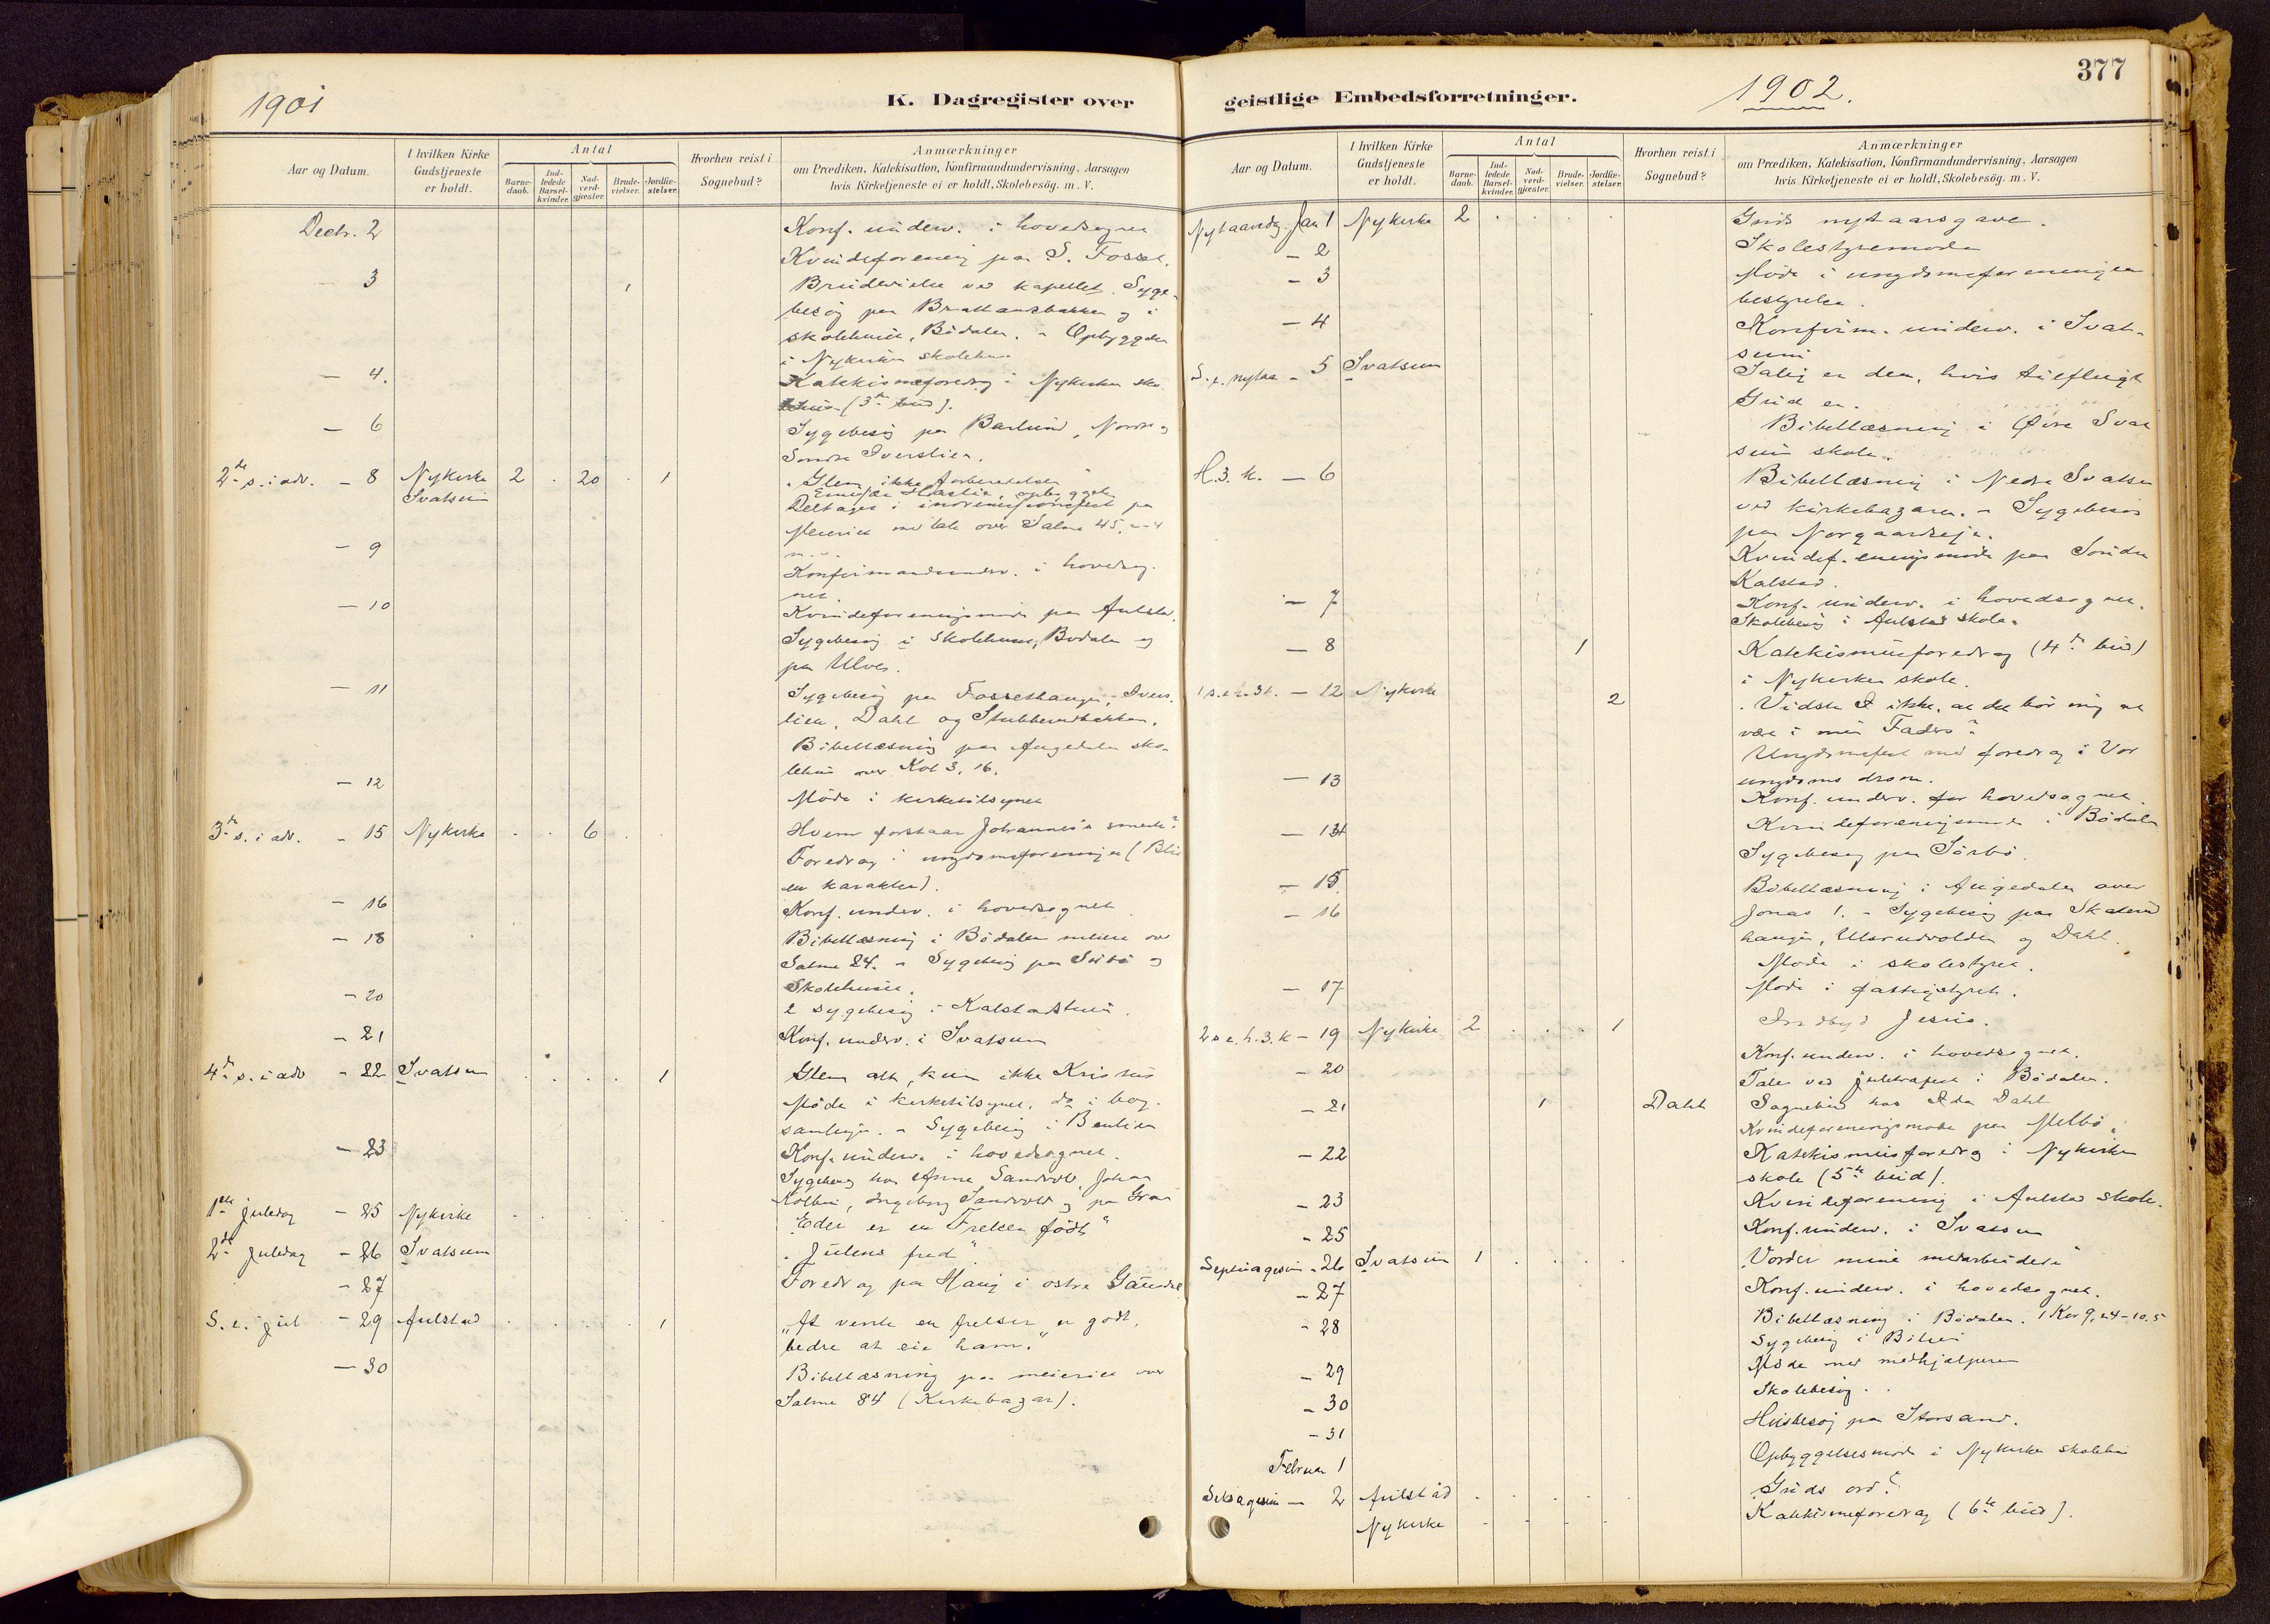 SAH, Vestre Gausdal prestekontor, Ministerialbok nr. 1, 1887-1914, s. 377